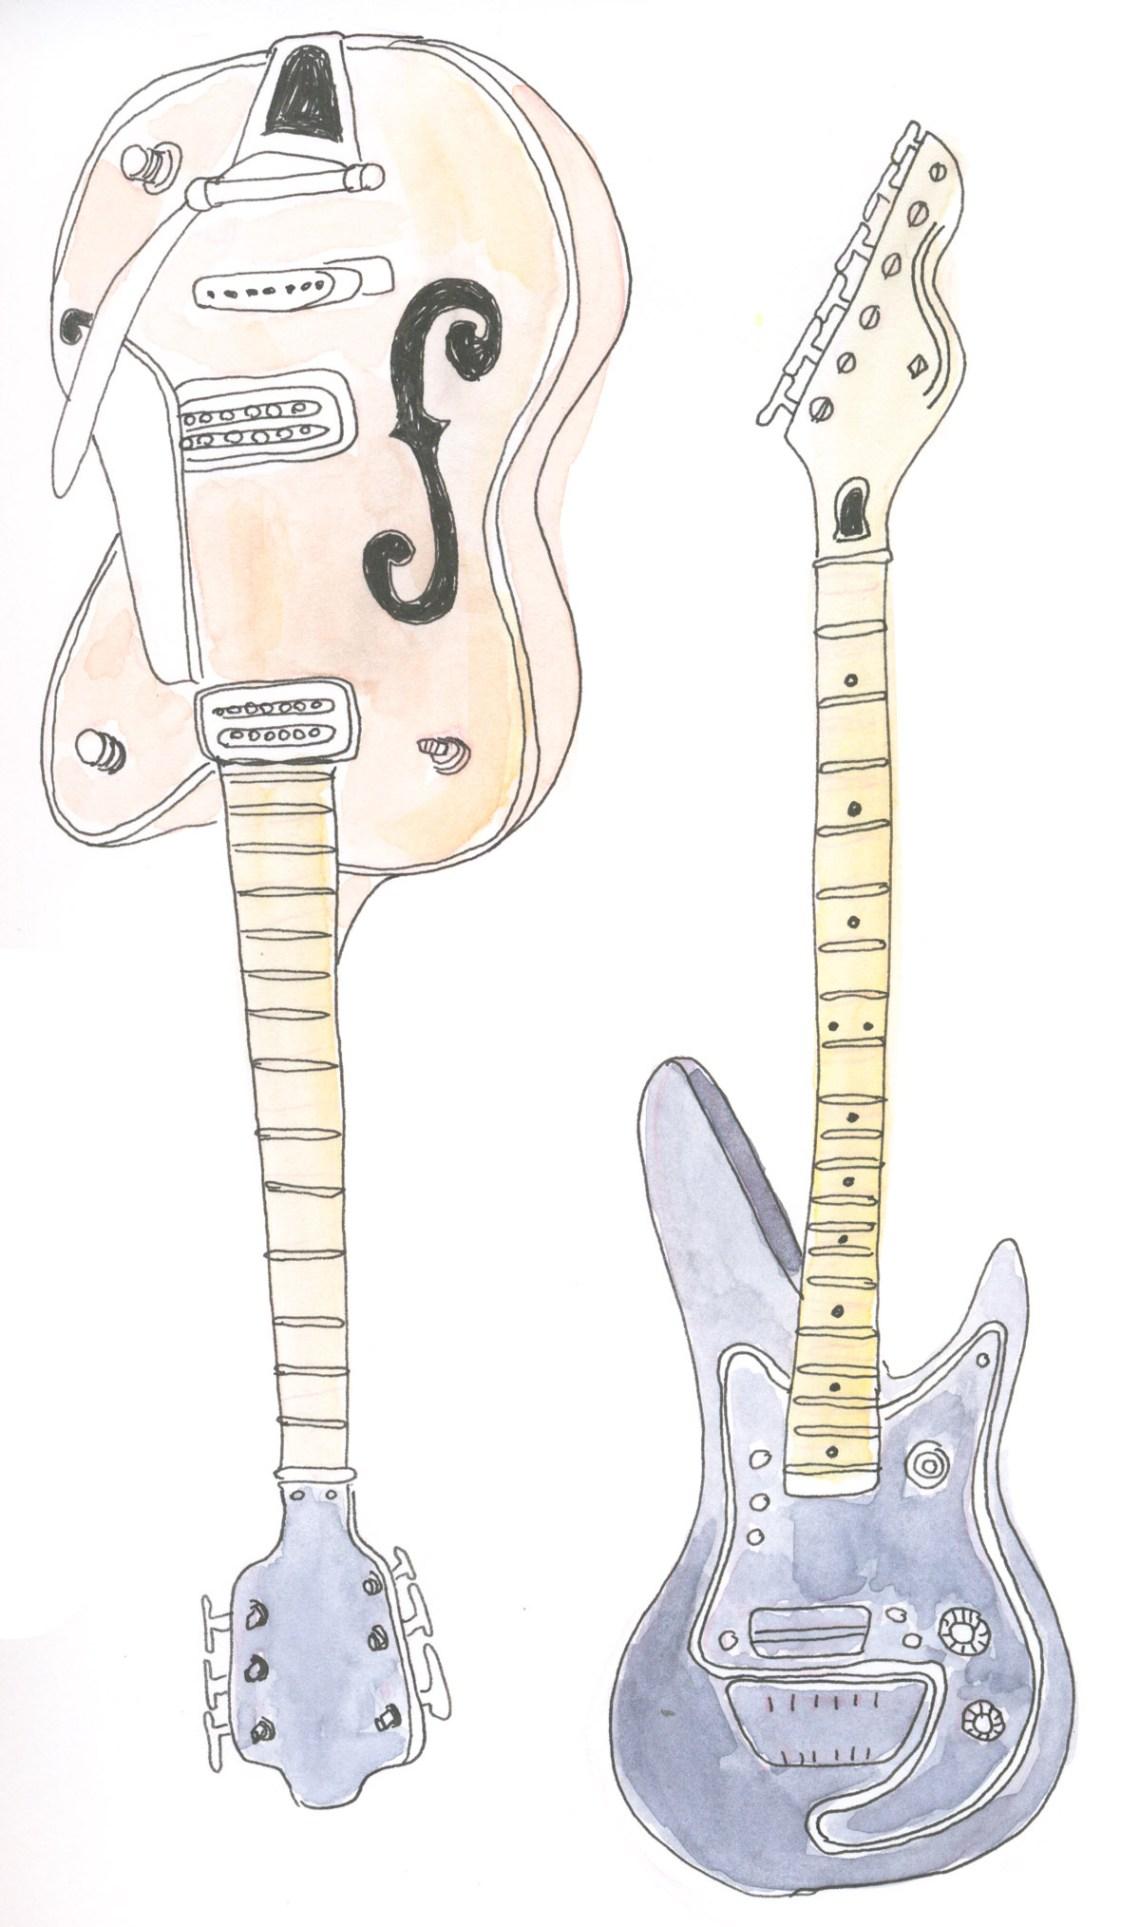 Inktober 2019 - Guitars